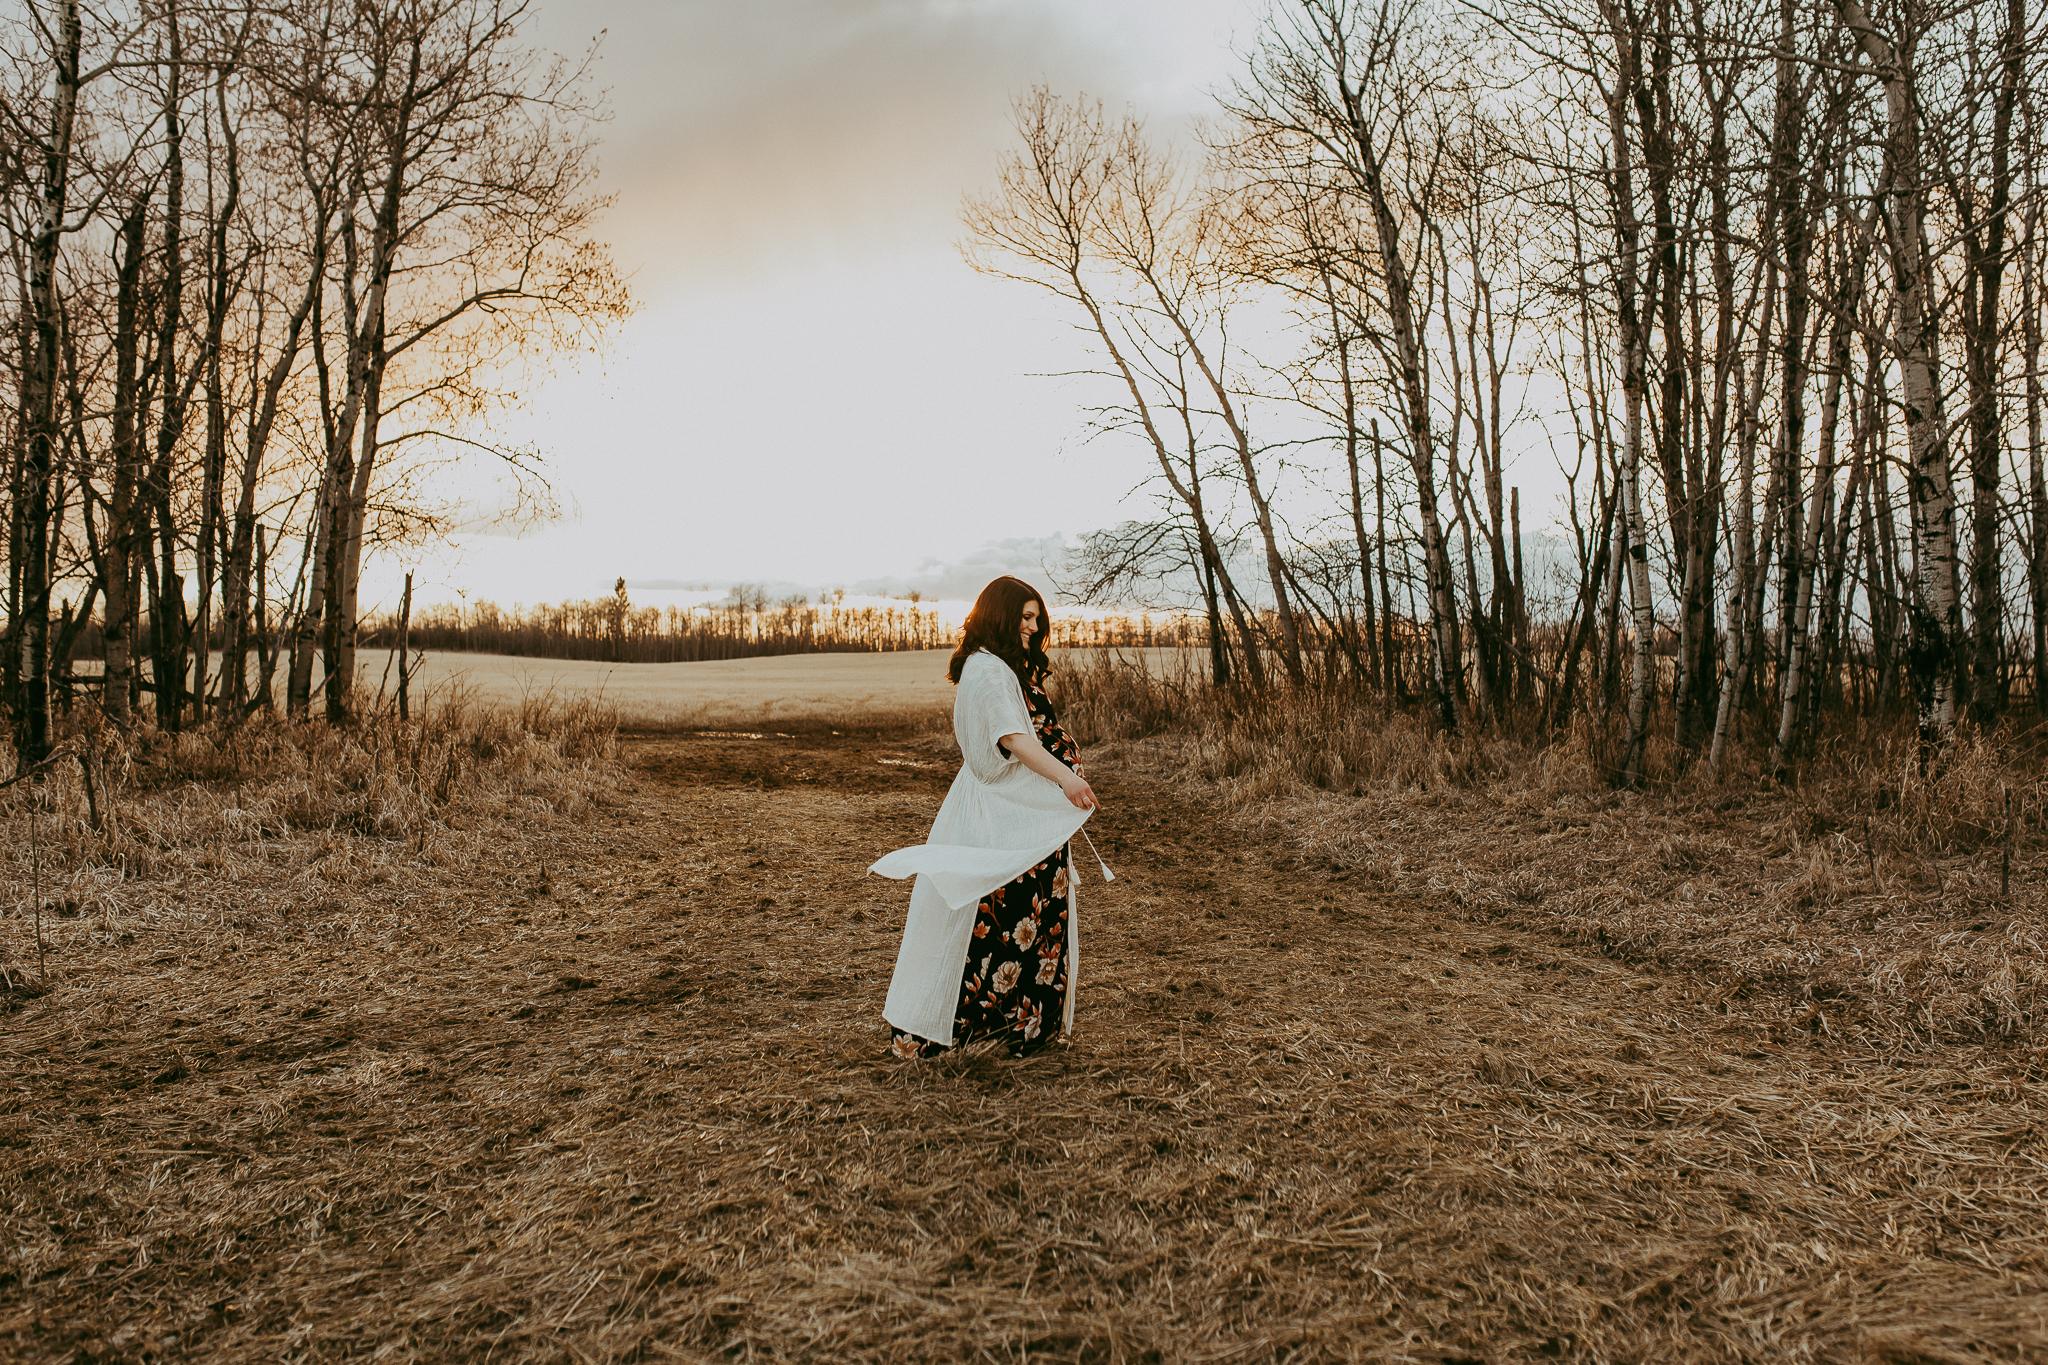 Alina-Joy-Photography-Cold-Lake-Maternity-Photographer-Josee-57.jpg